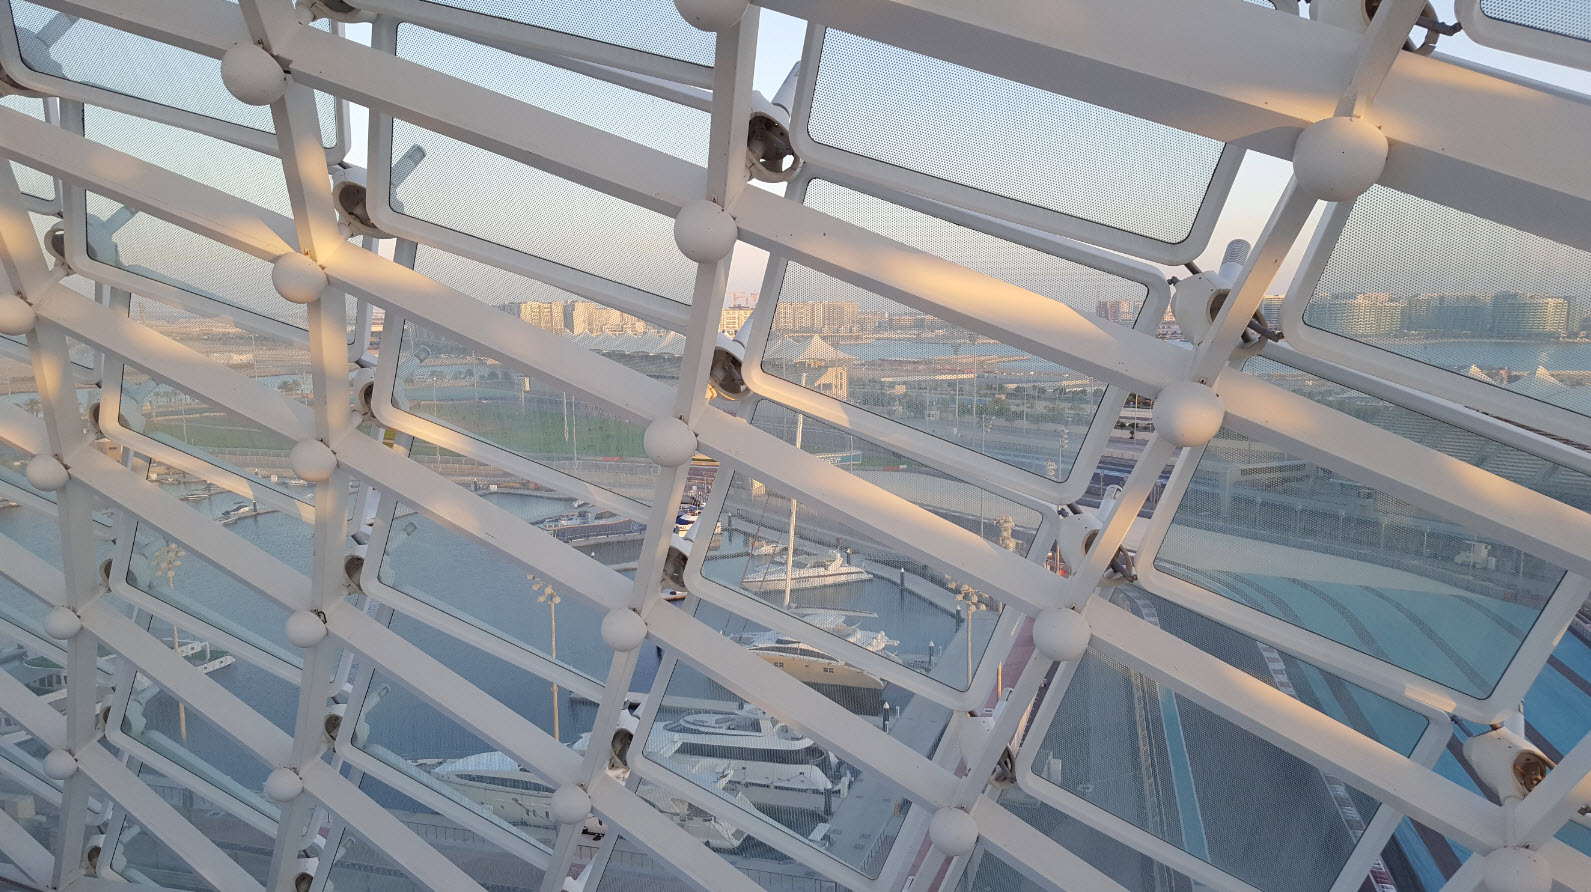 Circuit F1 Abu Dhabi